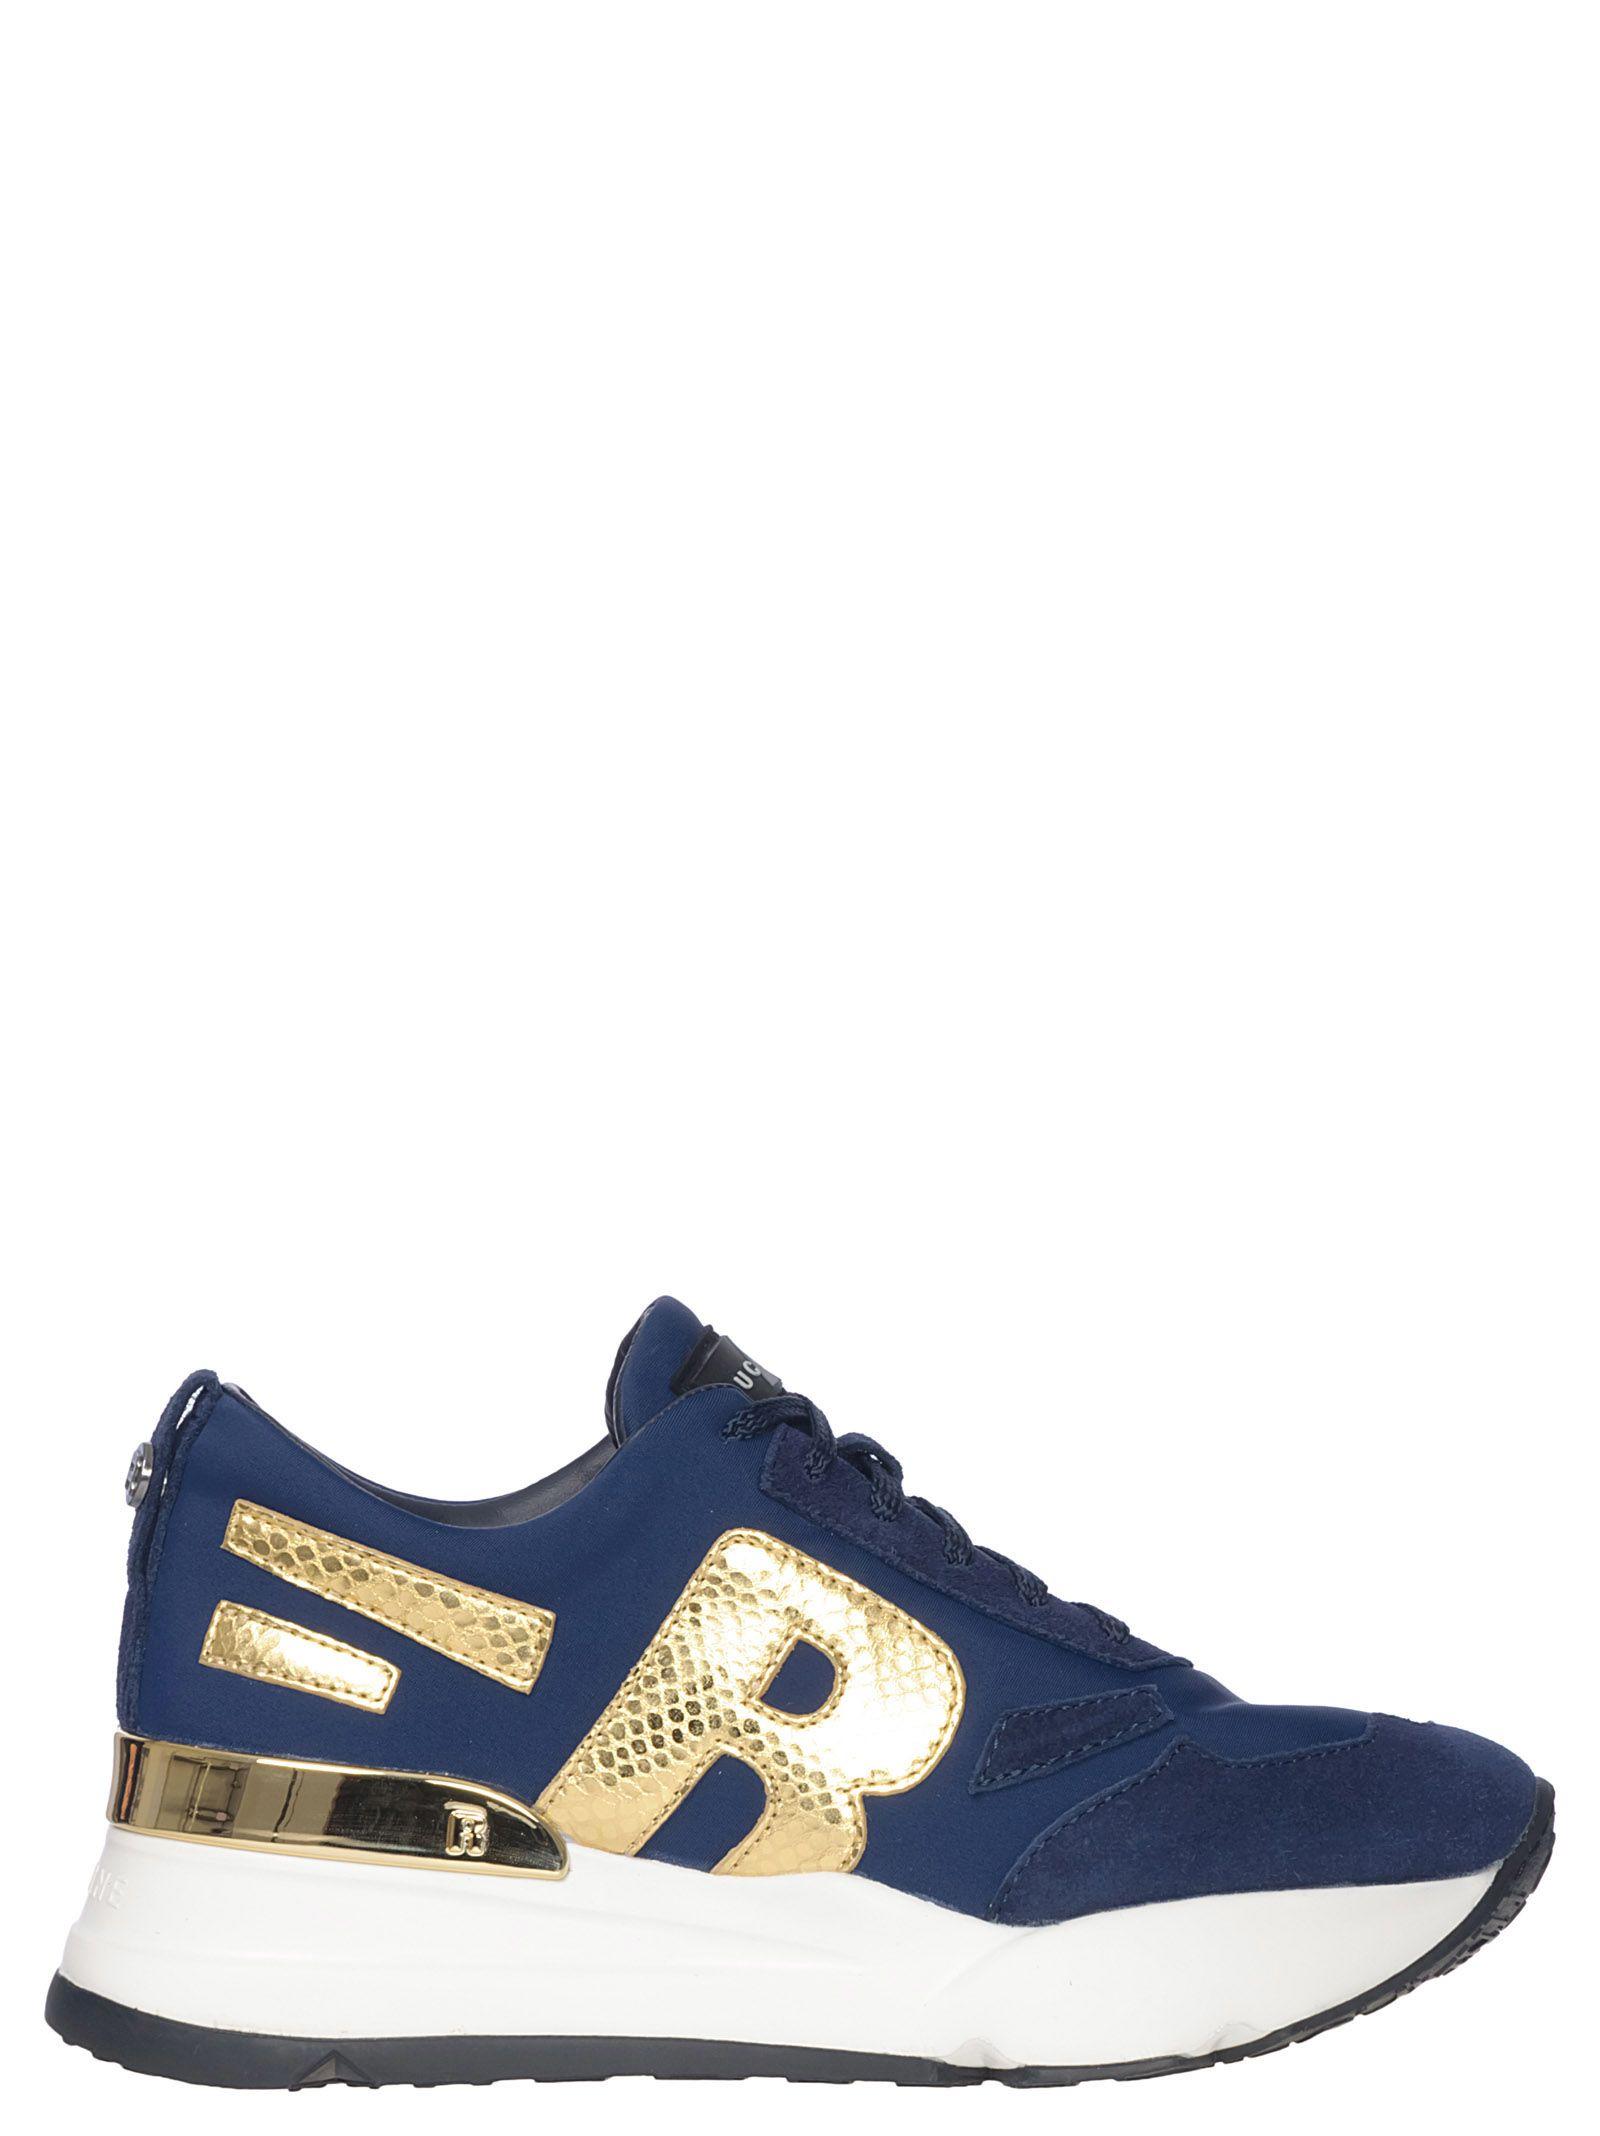 RUCO LINE Rucoline Sneakers Melog in Blu